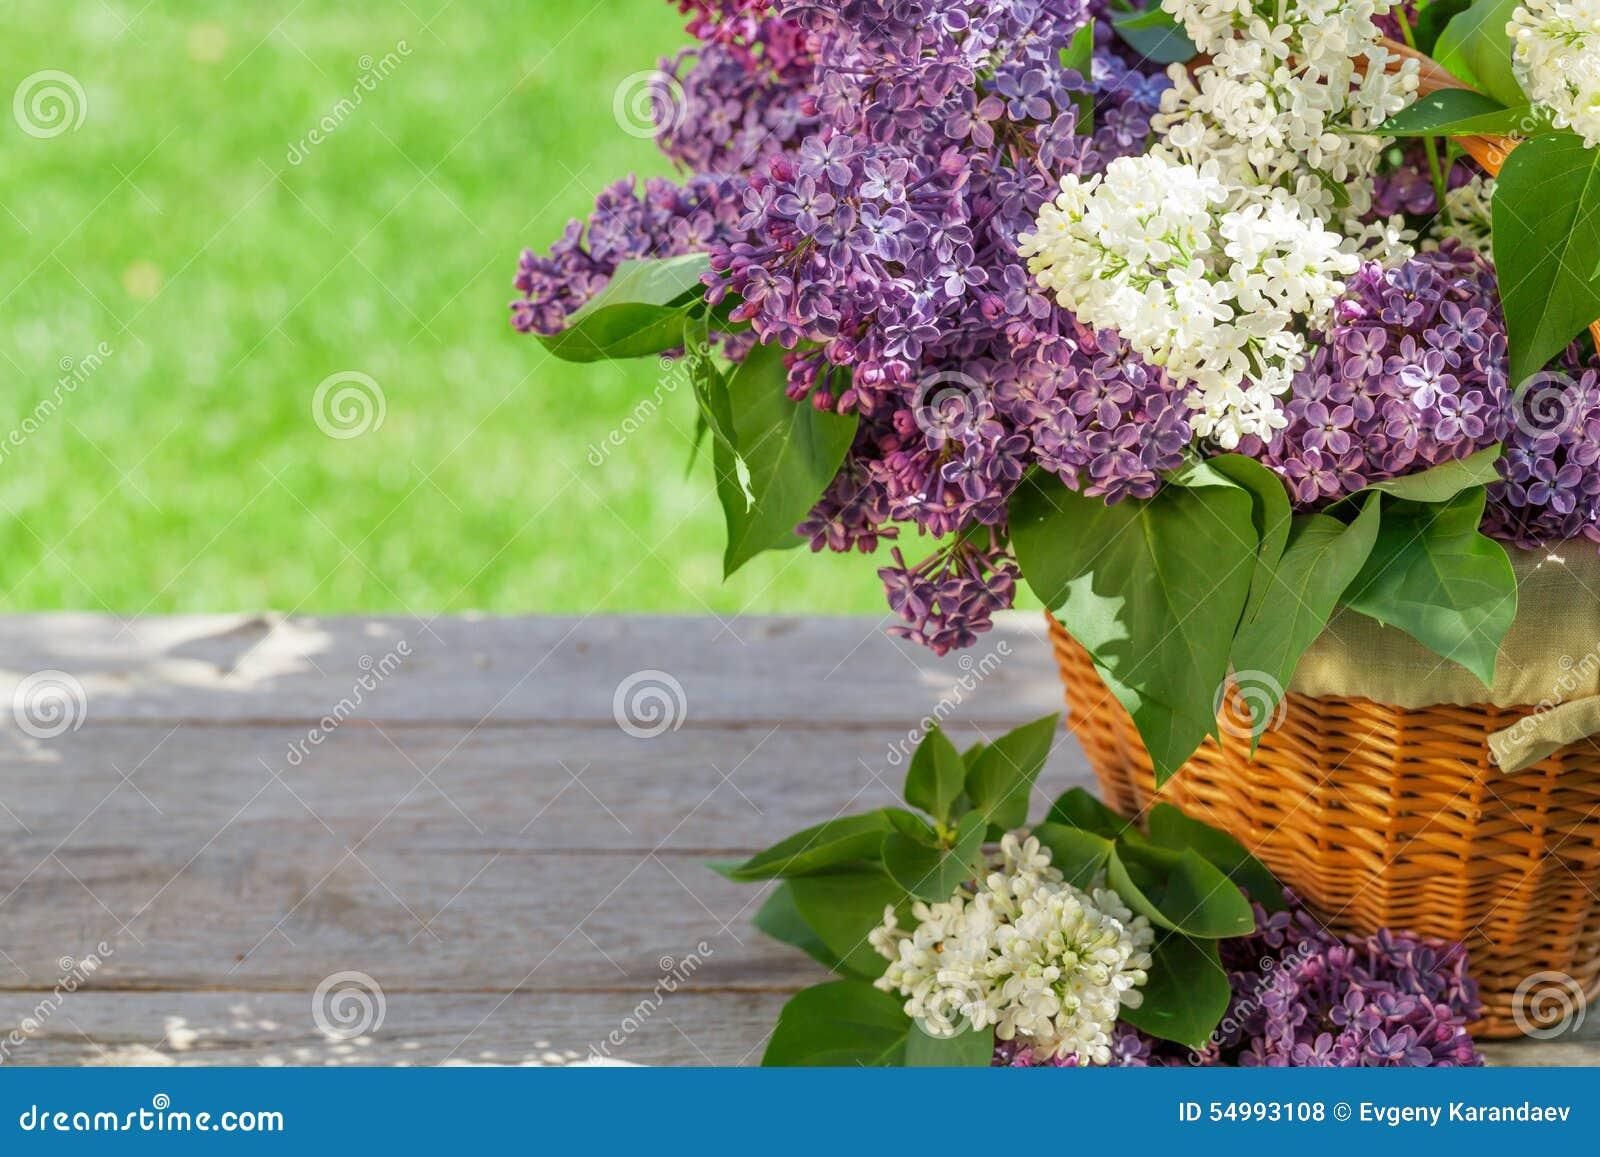 Bunte lila Blumen im Korb